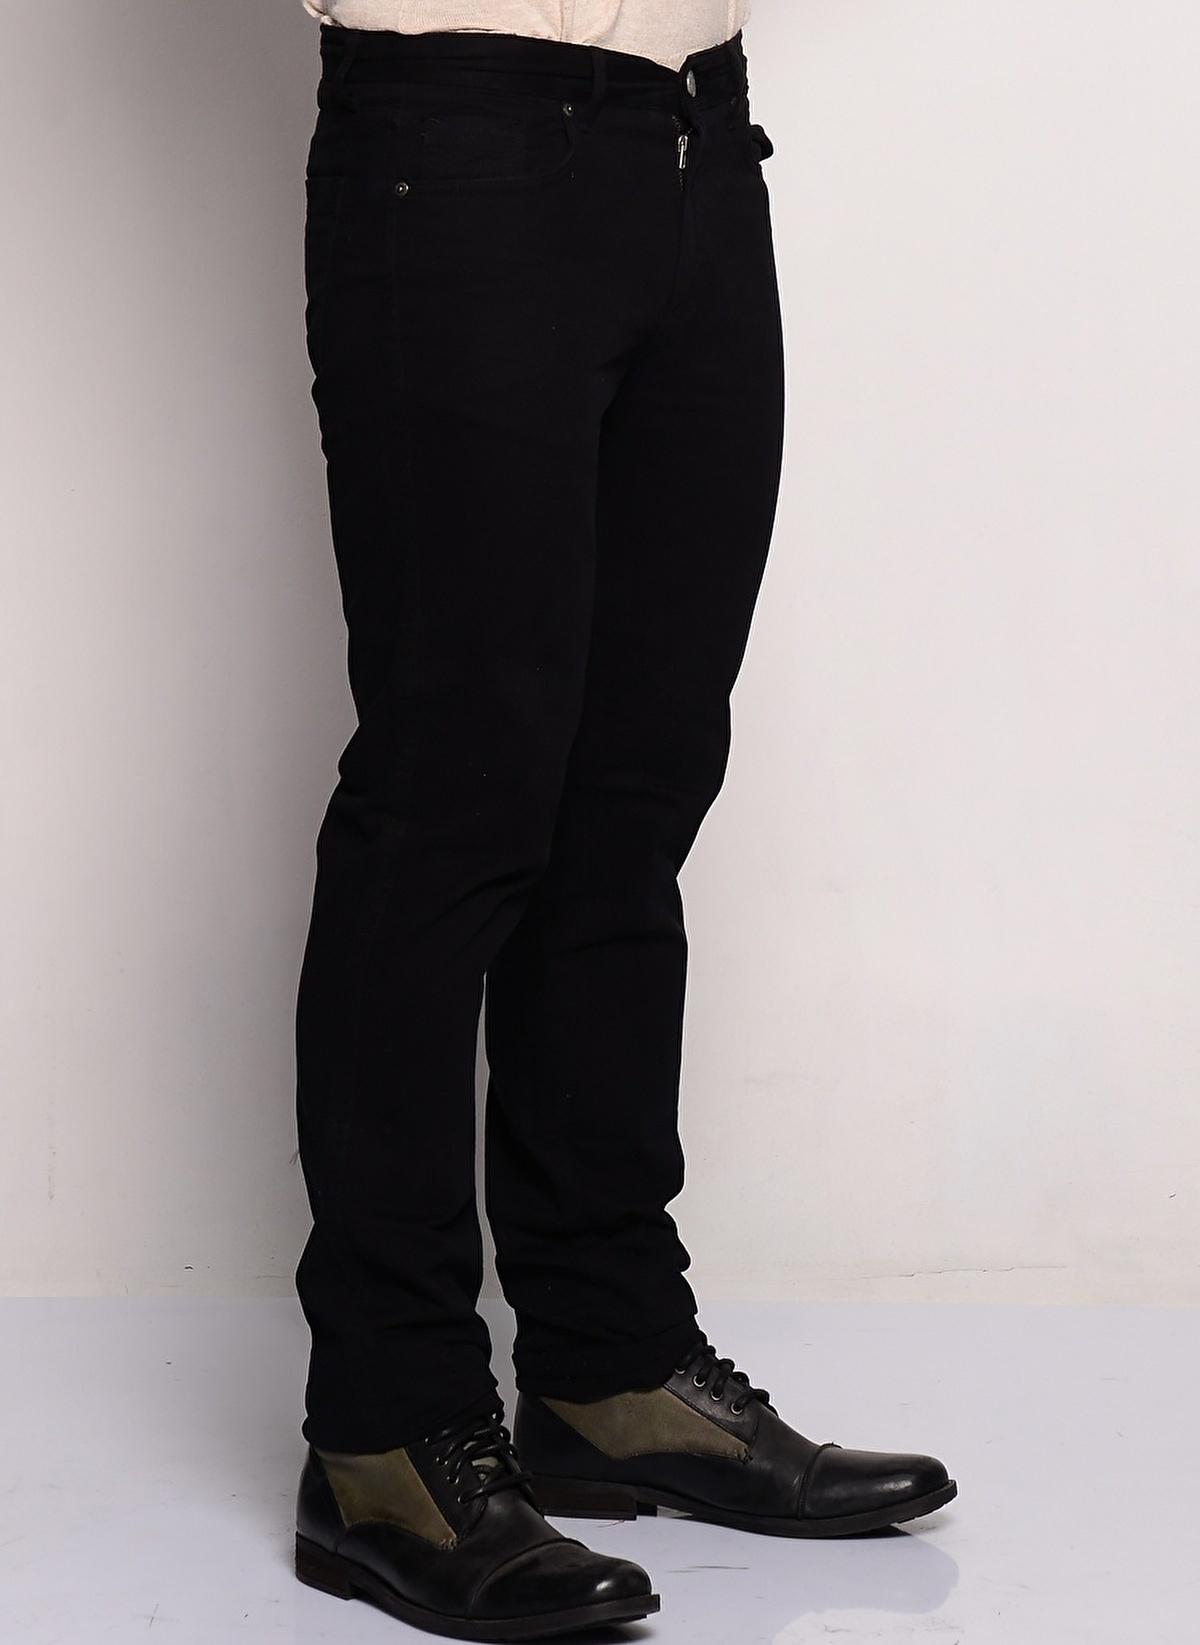 Fresh Company Pantolon 52ayd Bahadır Pantolon – 14.99 TL